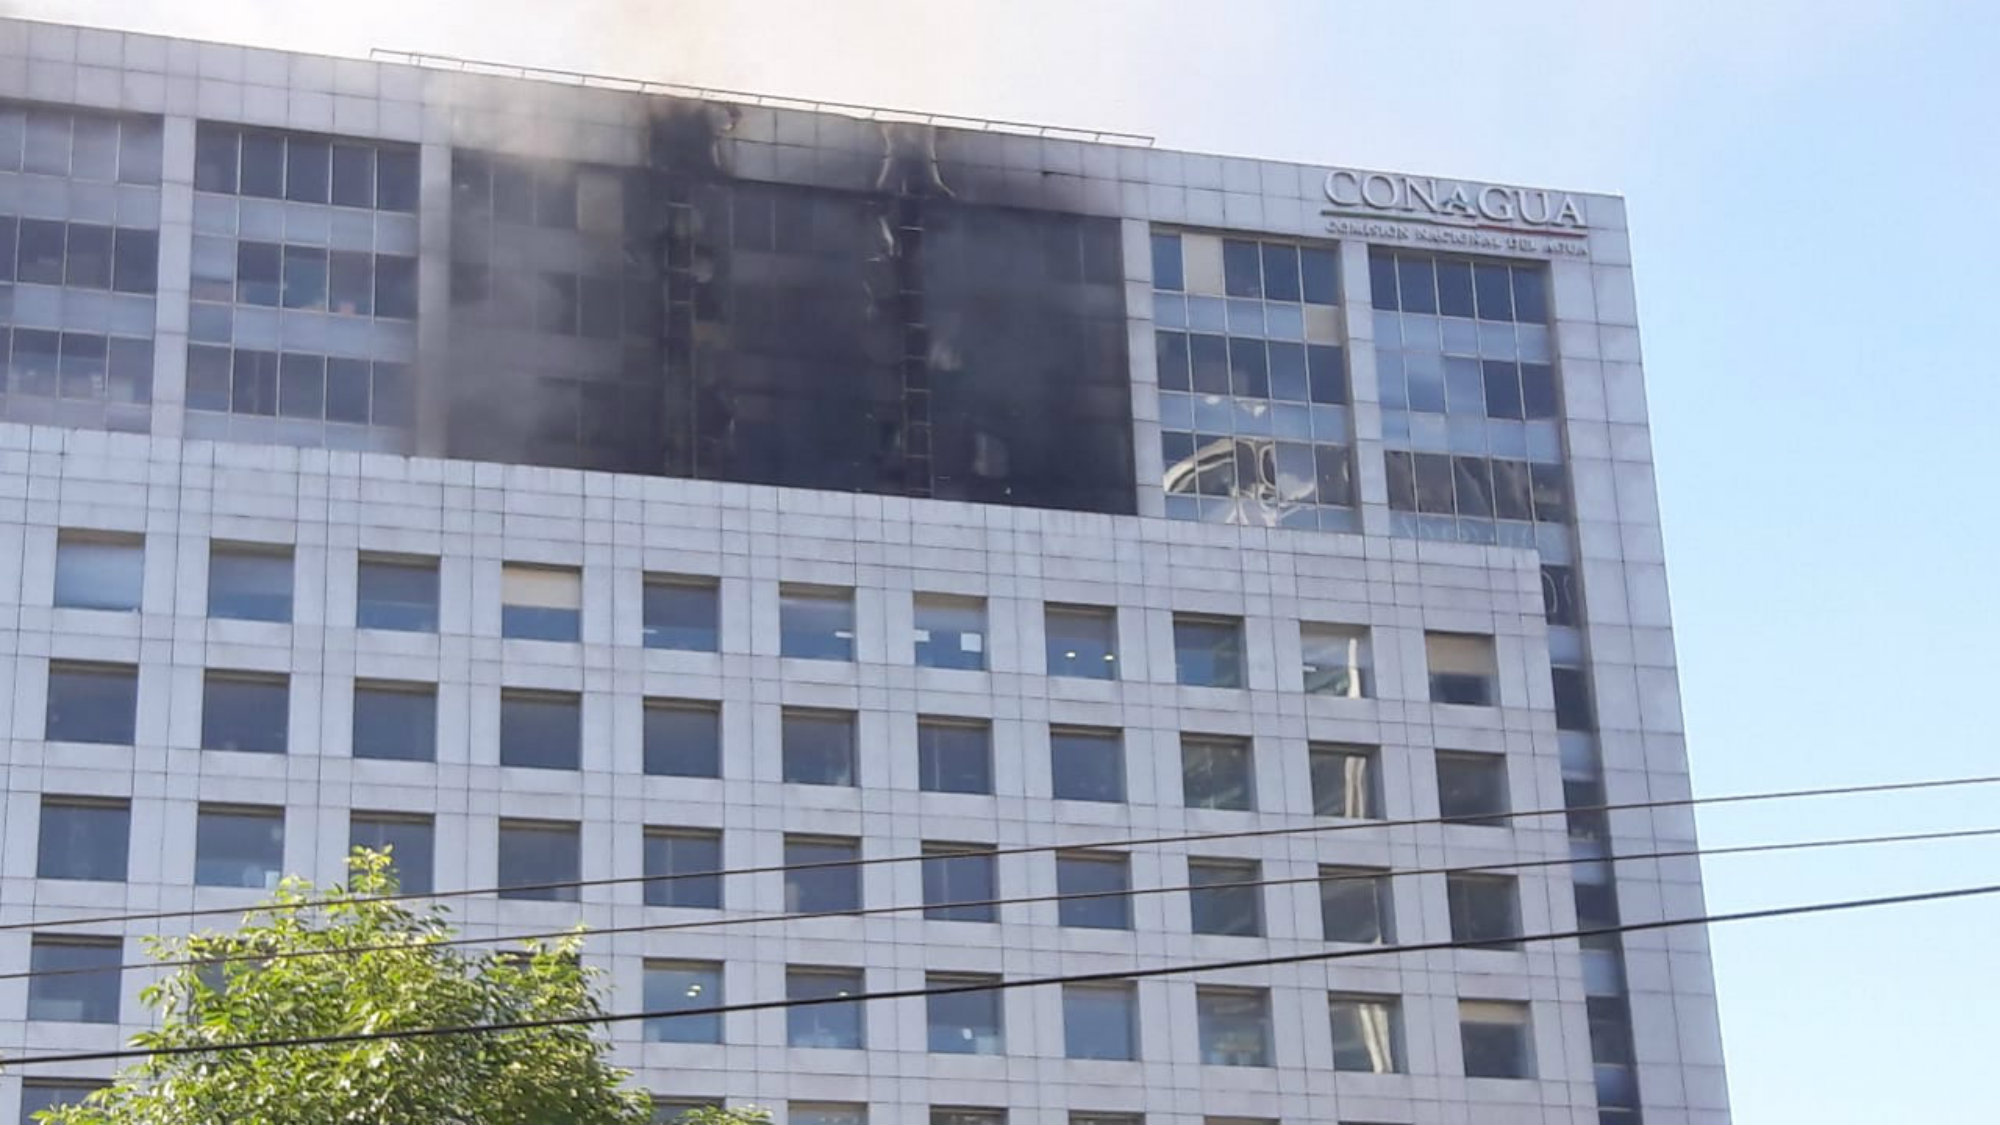 se incendia edificio de Conagua CDMX